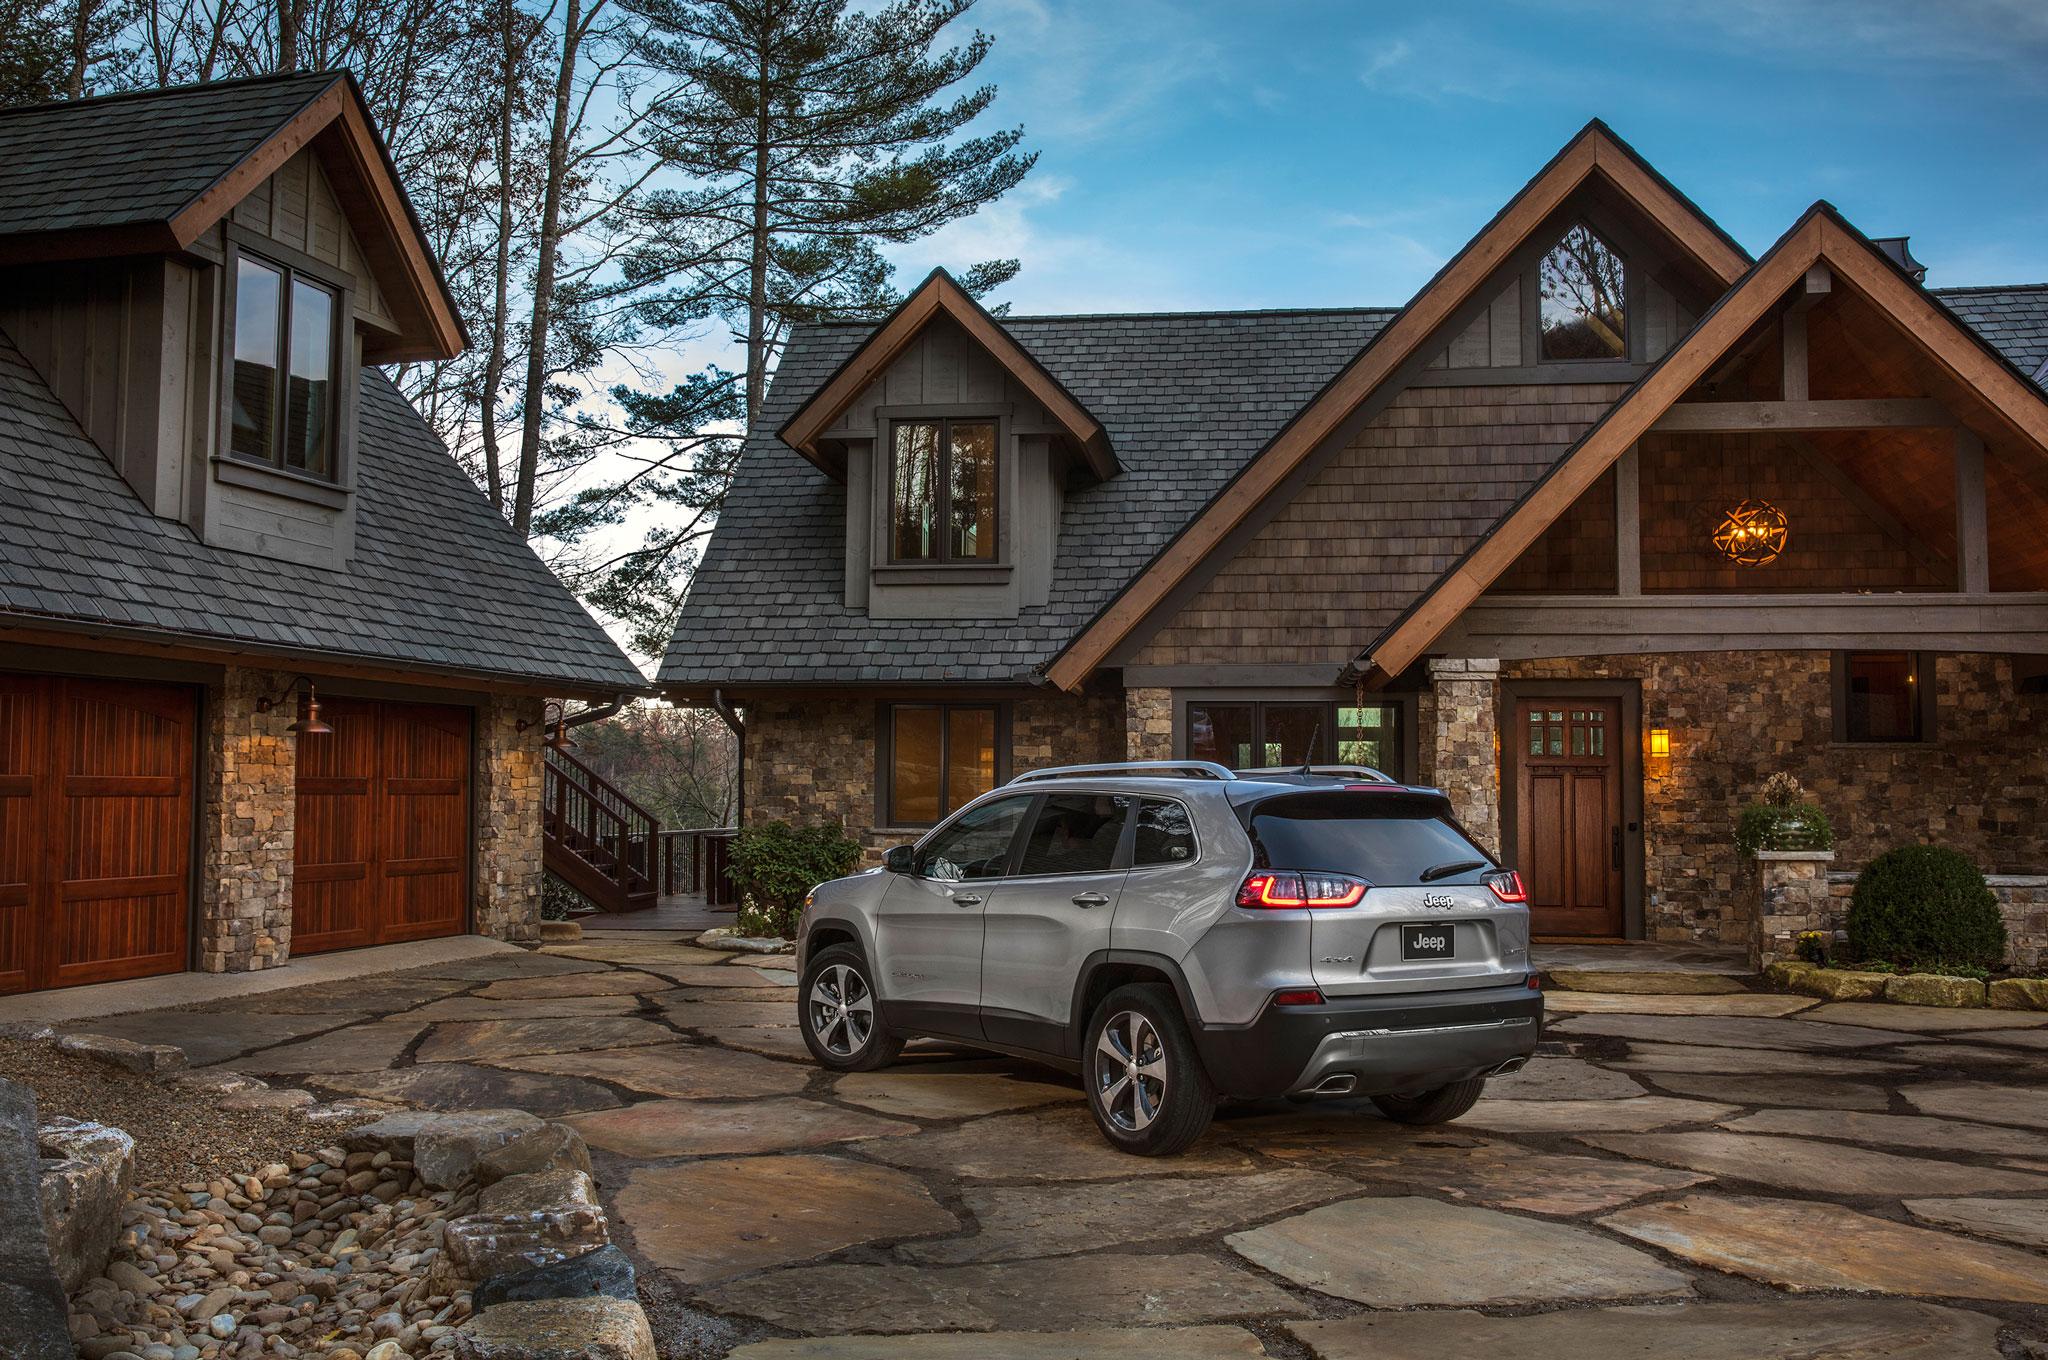 2019 Cherokee rear at house